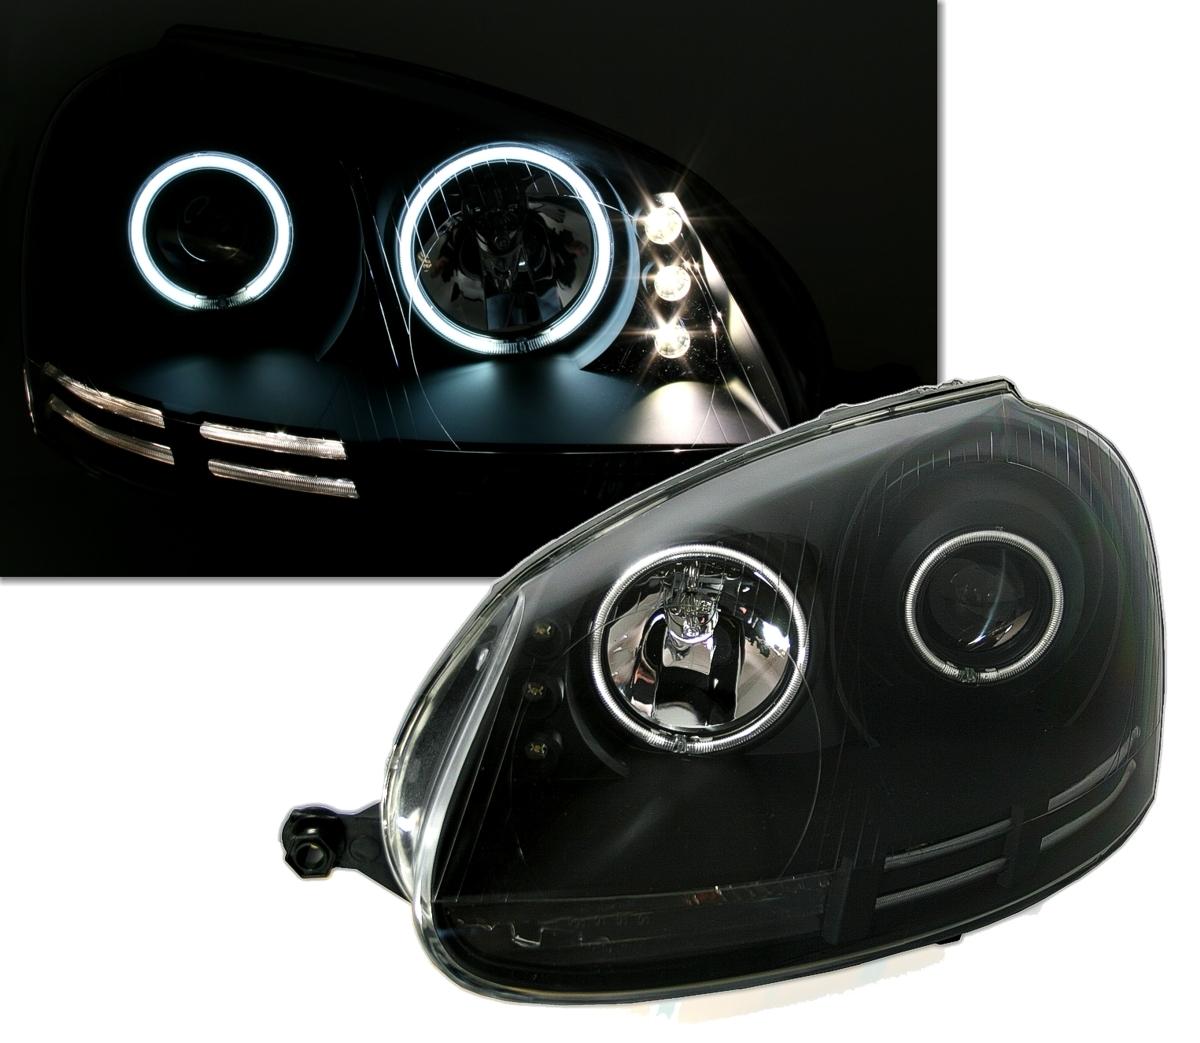 ccfl angel eyes scheinwerfer f r vw golf 5 ad tuning. Black Bedroom Furniture Sets. Home Design Ideas